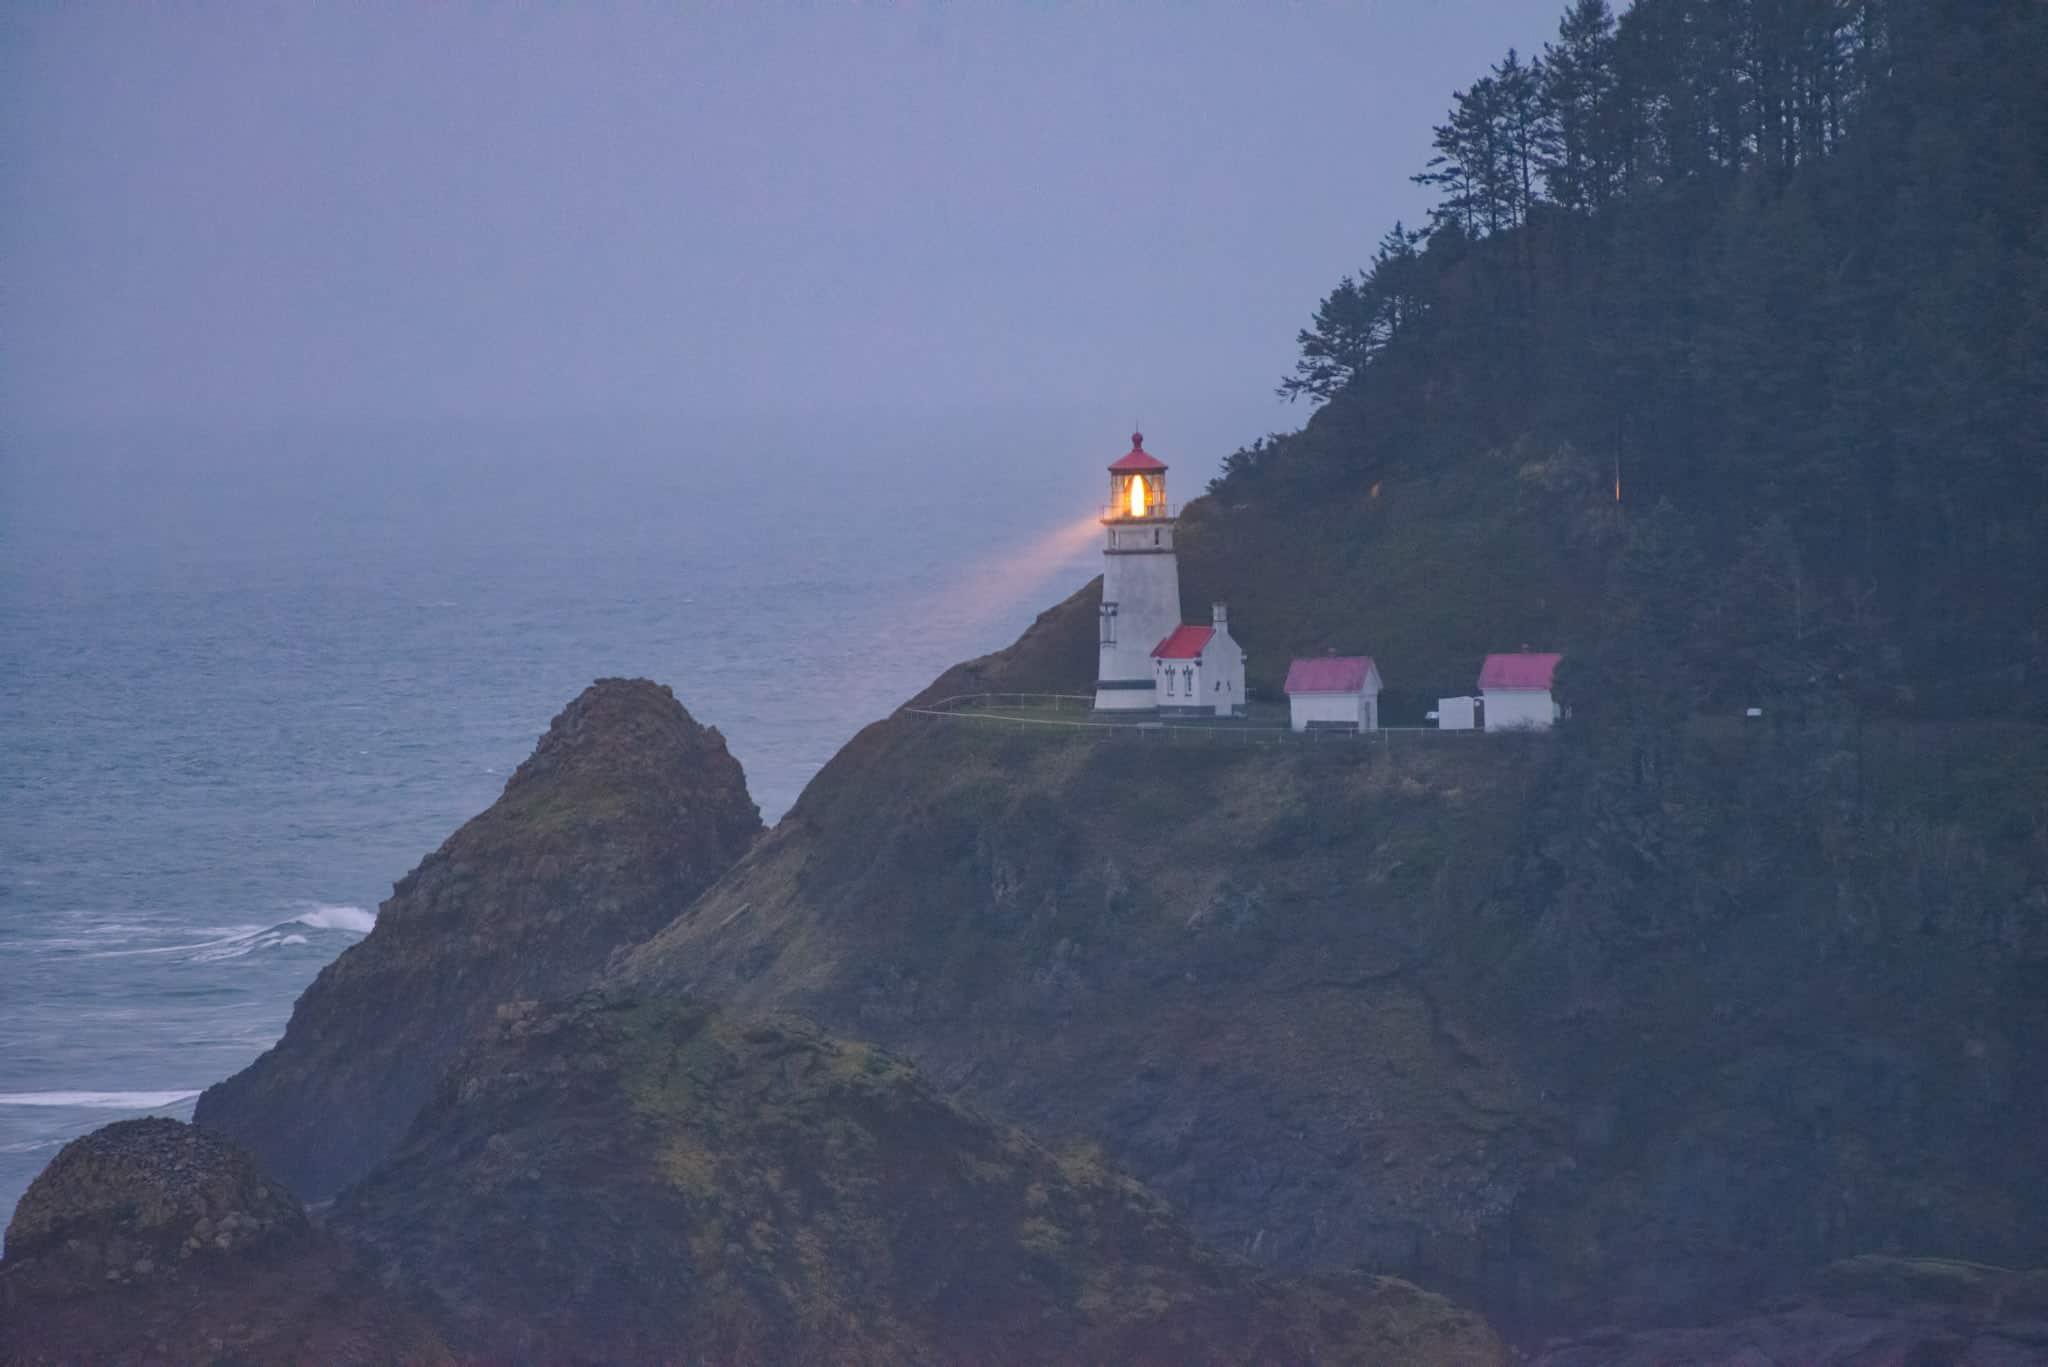 Heceta Head Lighthouse - Oregon's Pacific coast